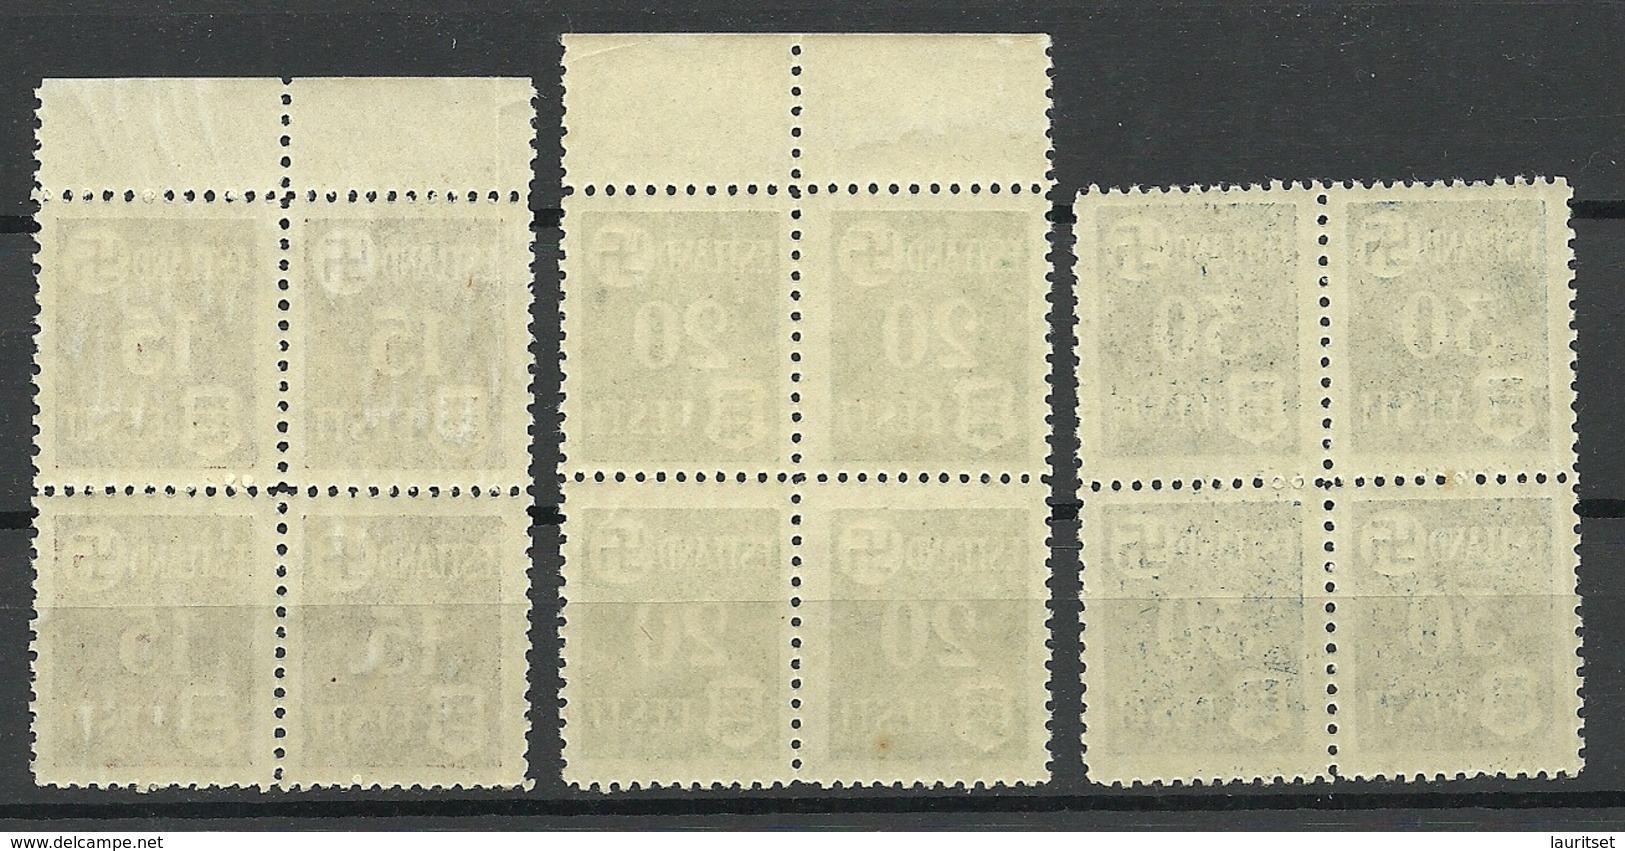 ESTLAND Estonia 1941 Michel 1 - 3 Y Tartu Dorpat 4-blocks Incl Druckfehler ERROR MNH - Besetzungen 1938-45